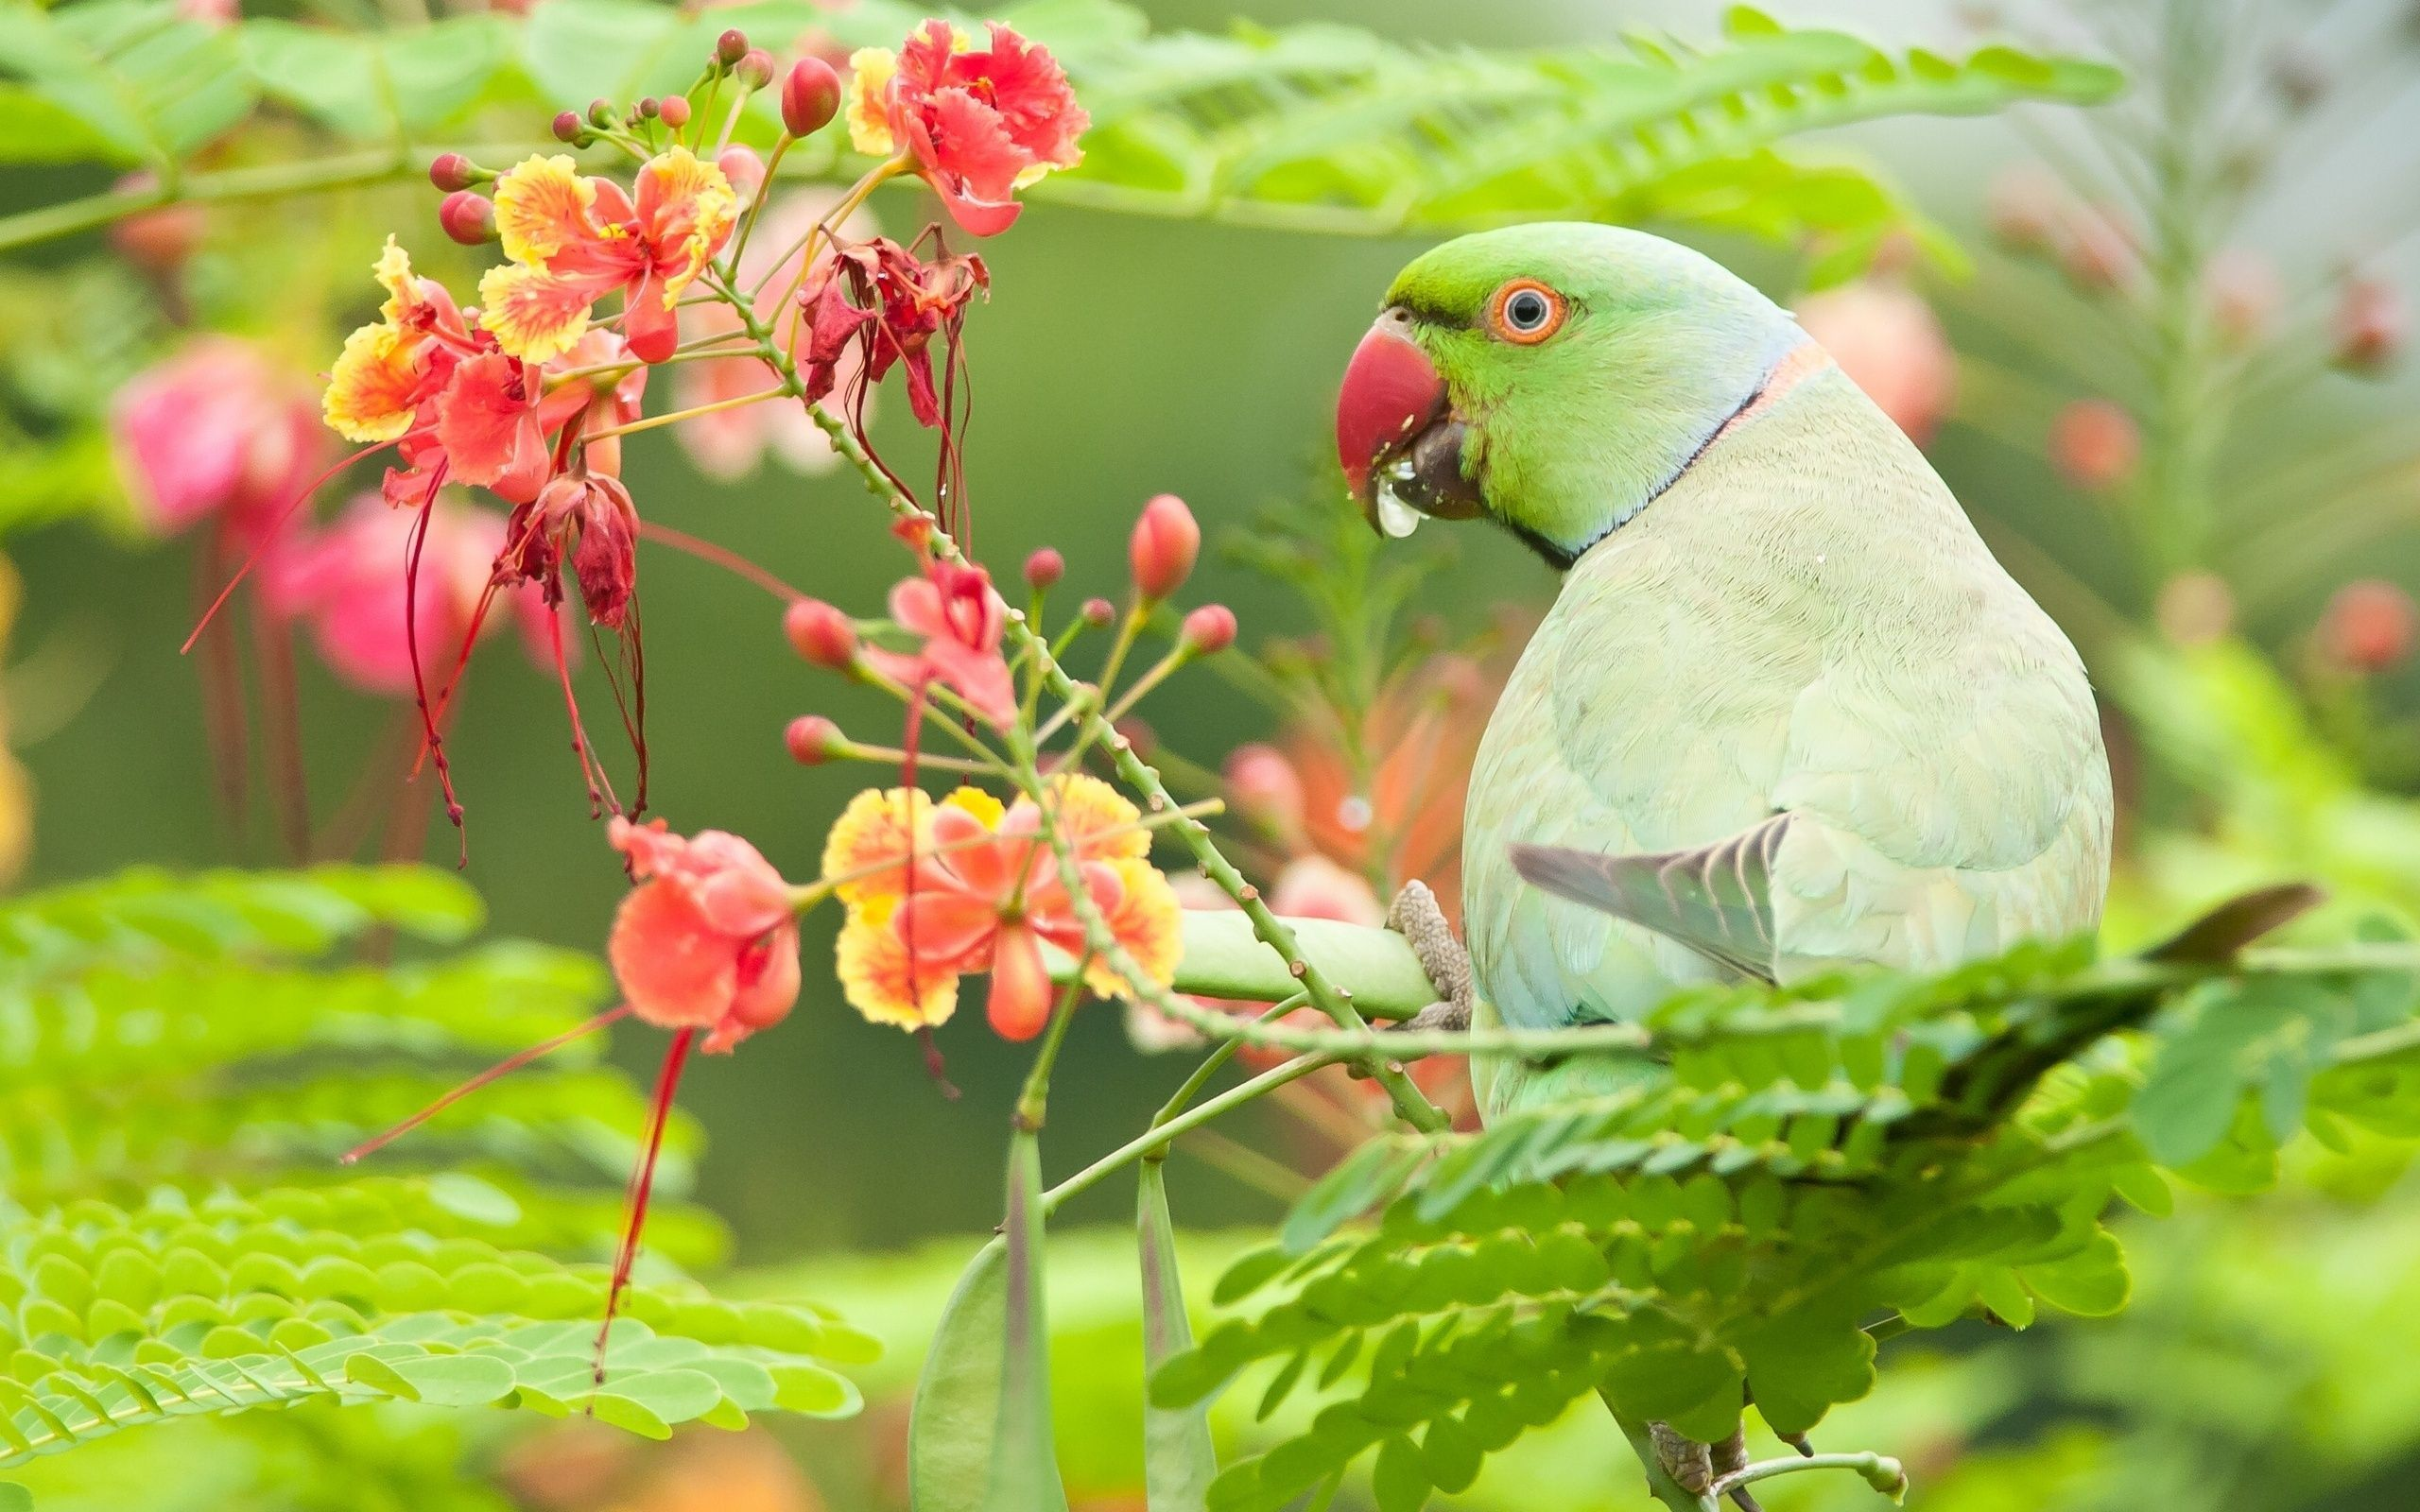 perot bird photo